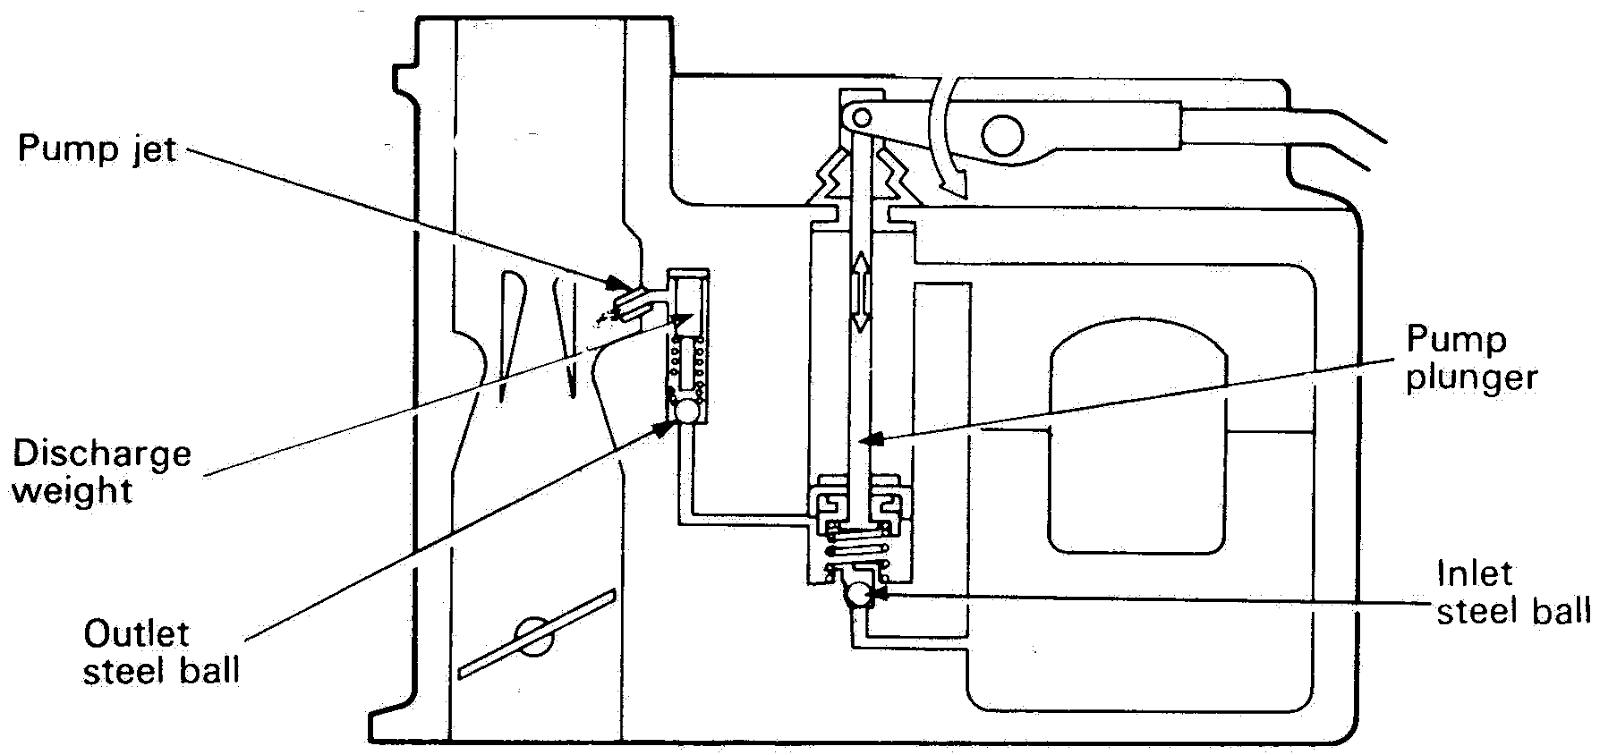 Cara Kerja / Fungsi Acceleration Pump (Pompa Akselerasi)